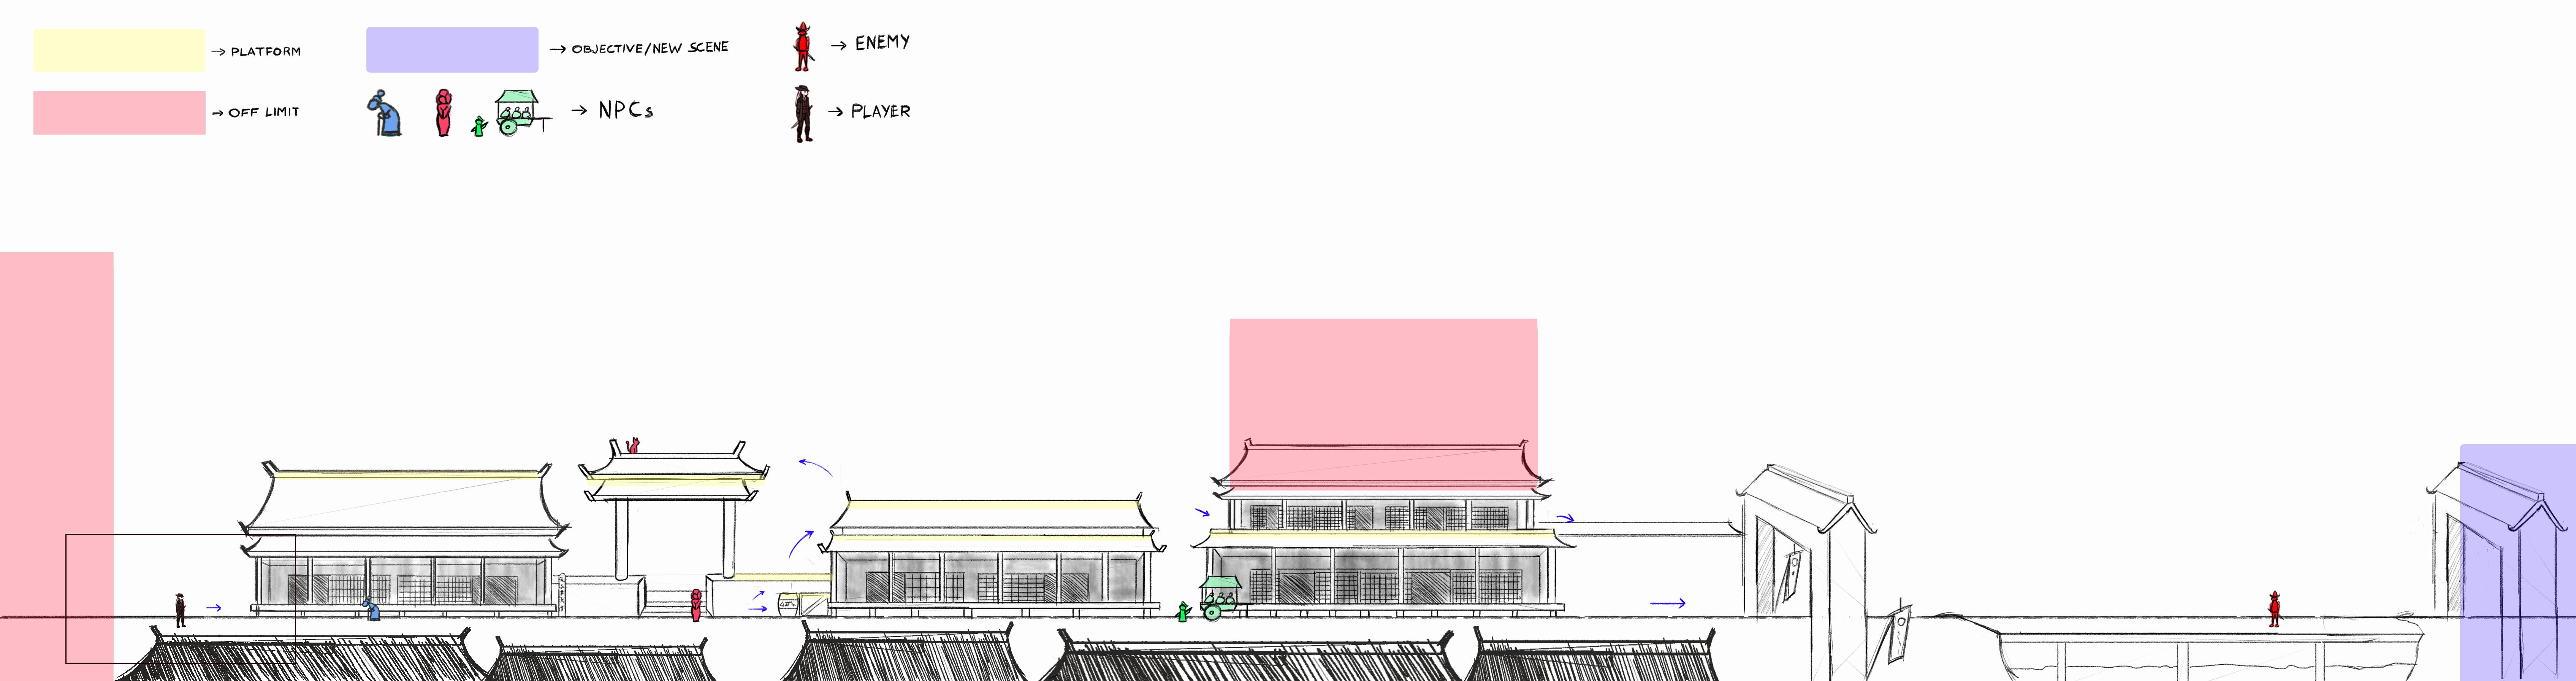 town level design